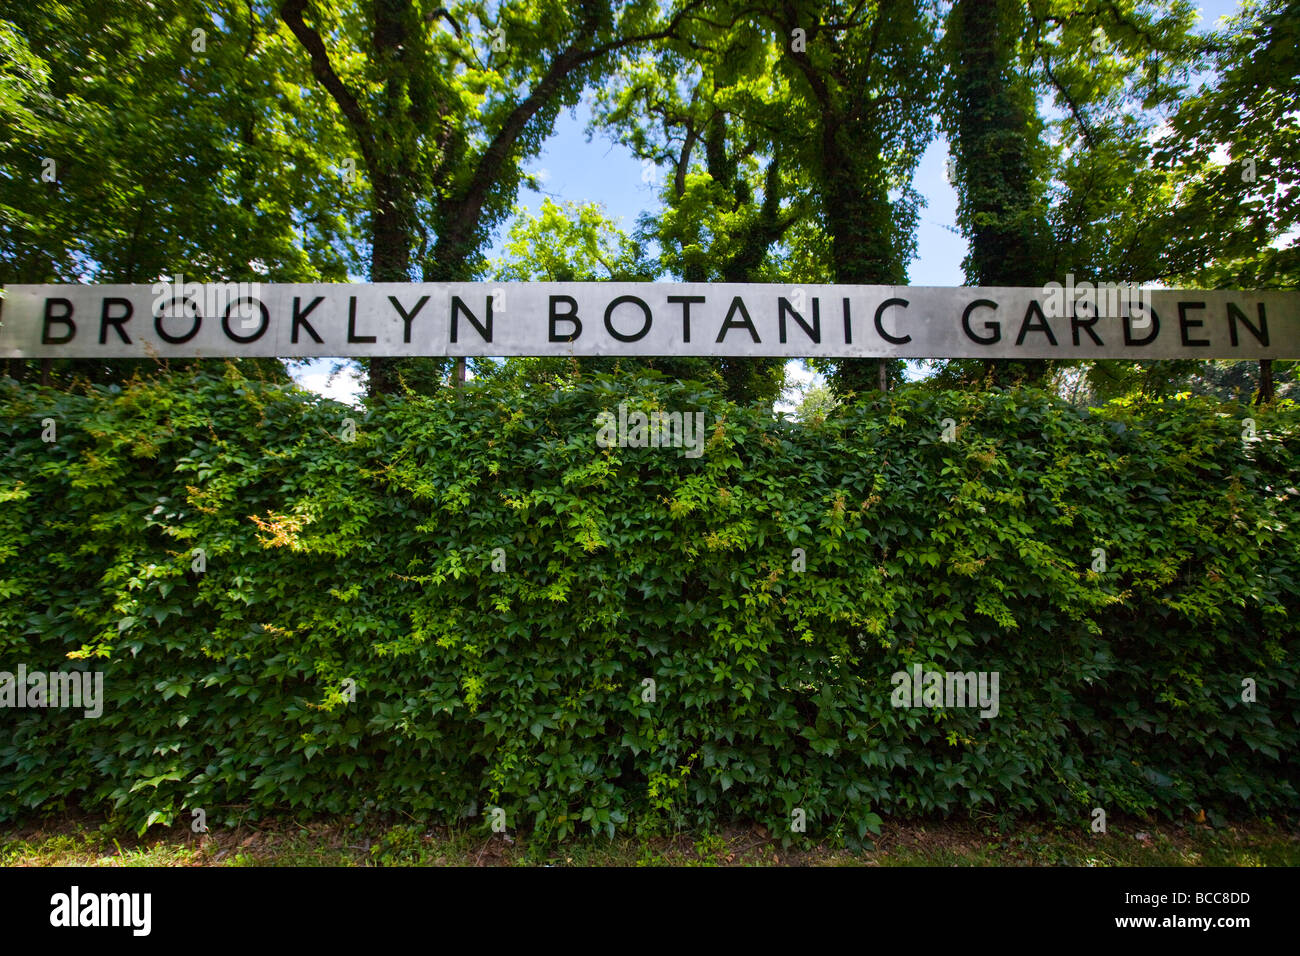 Brooklyn Botanic Garden In Brooklyn New York Stock Photo Royalty Free Image 24856313 Alamy